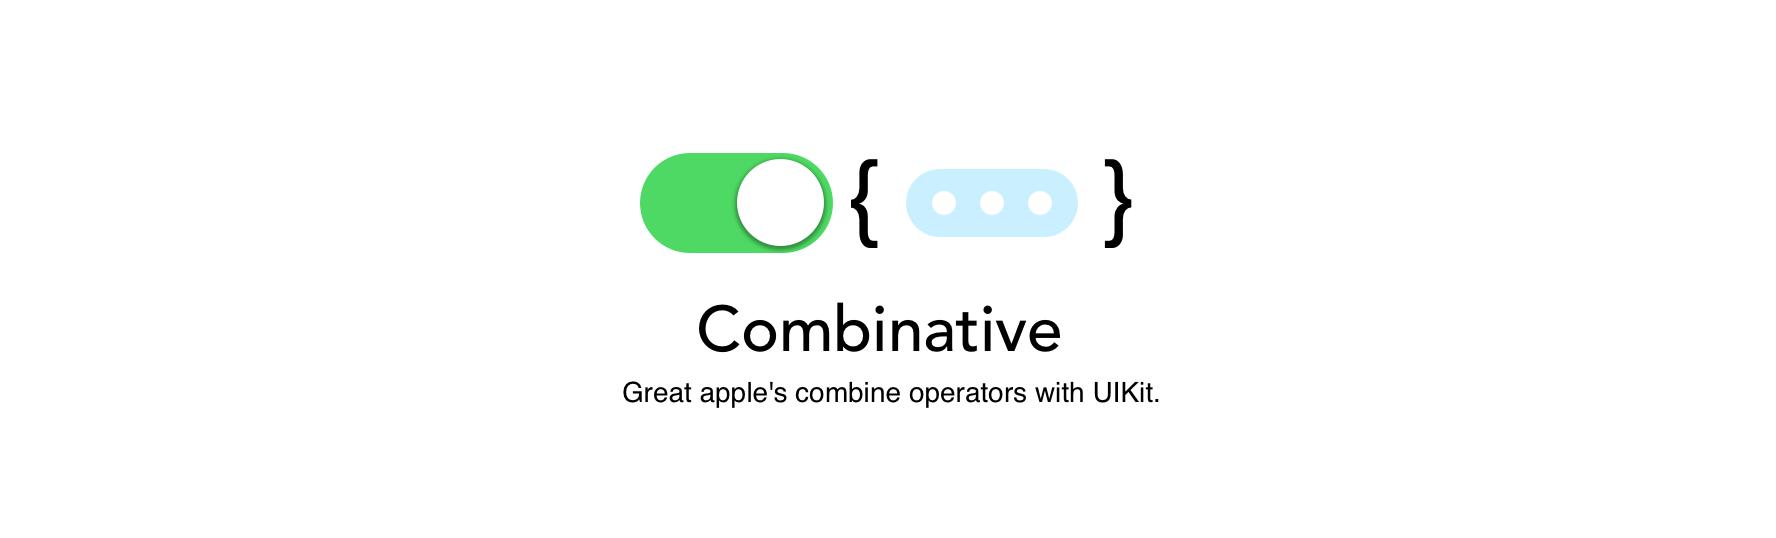 Combinative